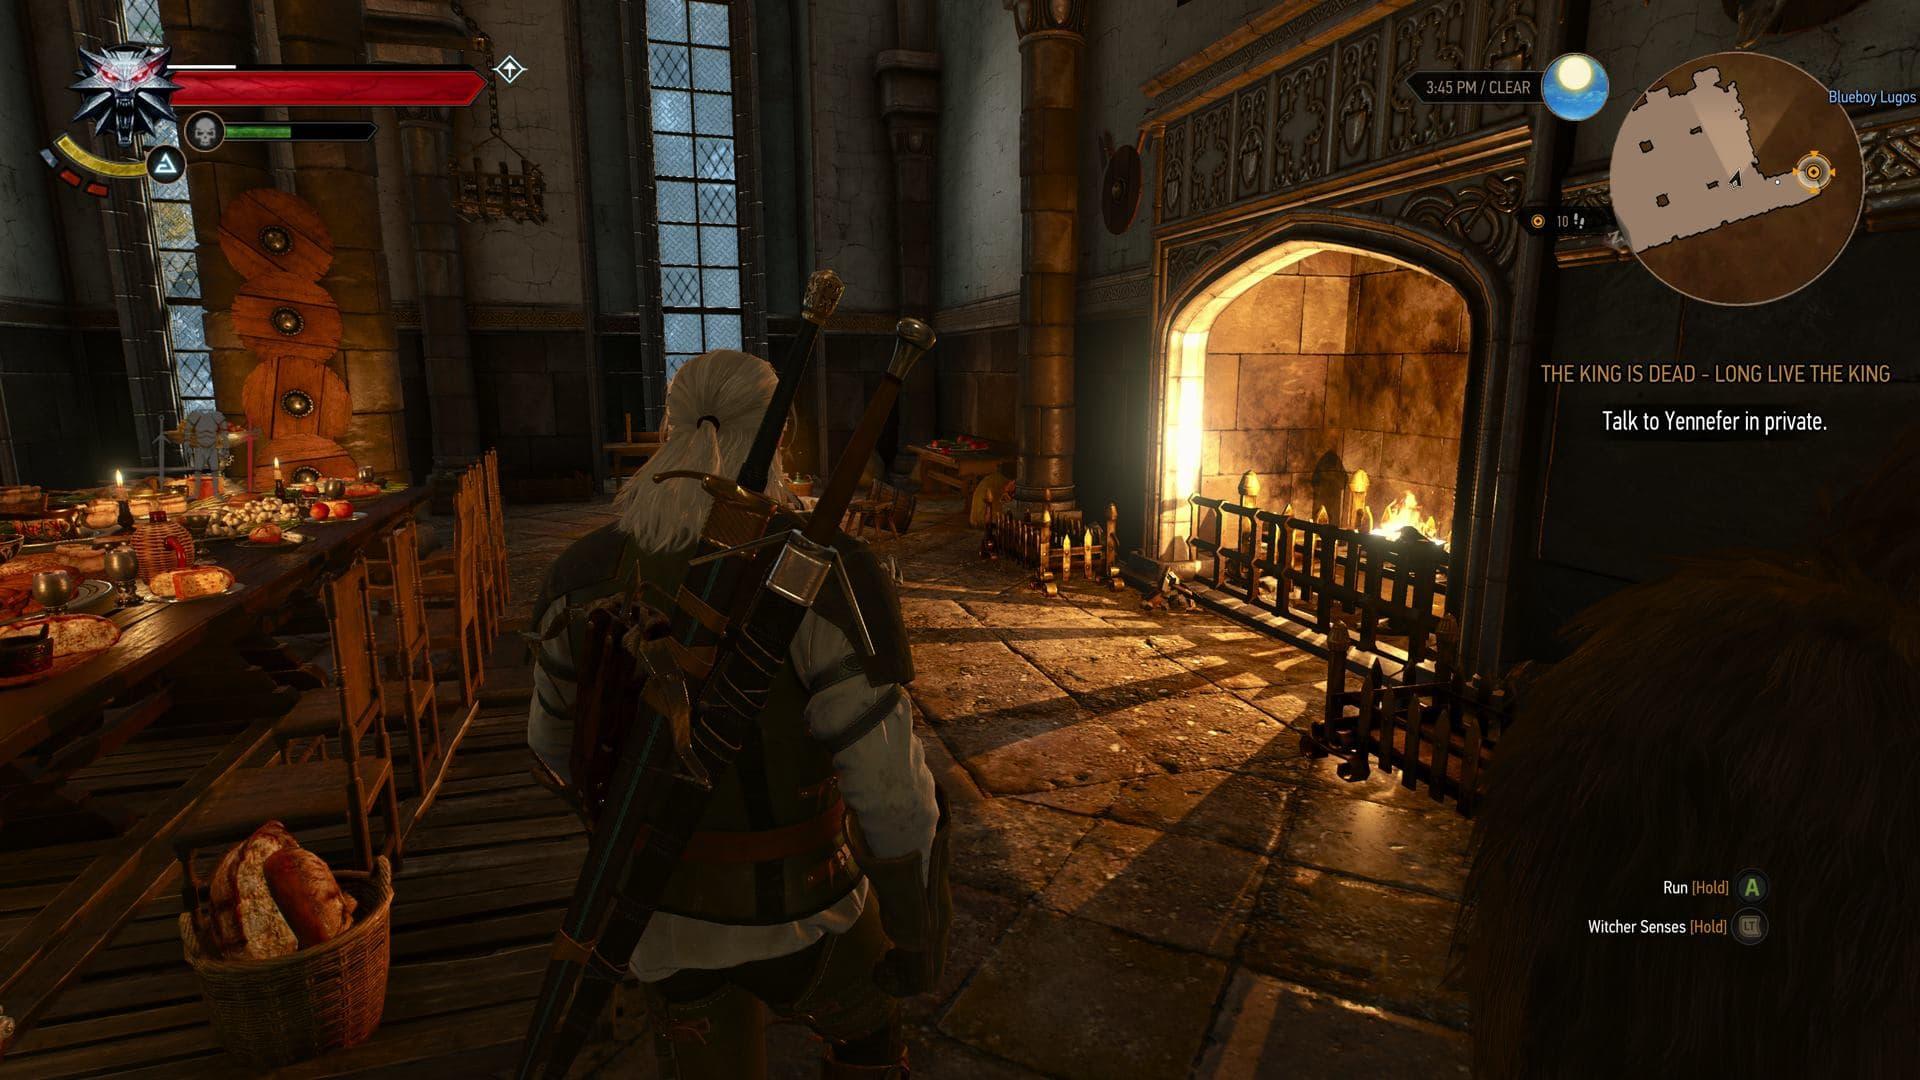 The Witcher 3: Wild Hunt Xbox